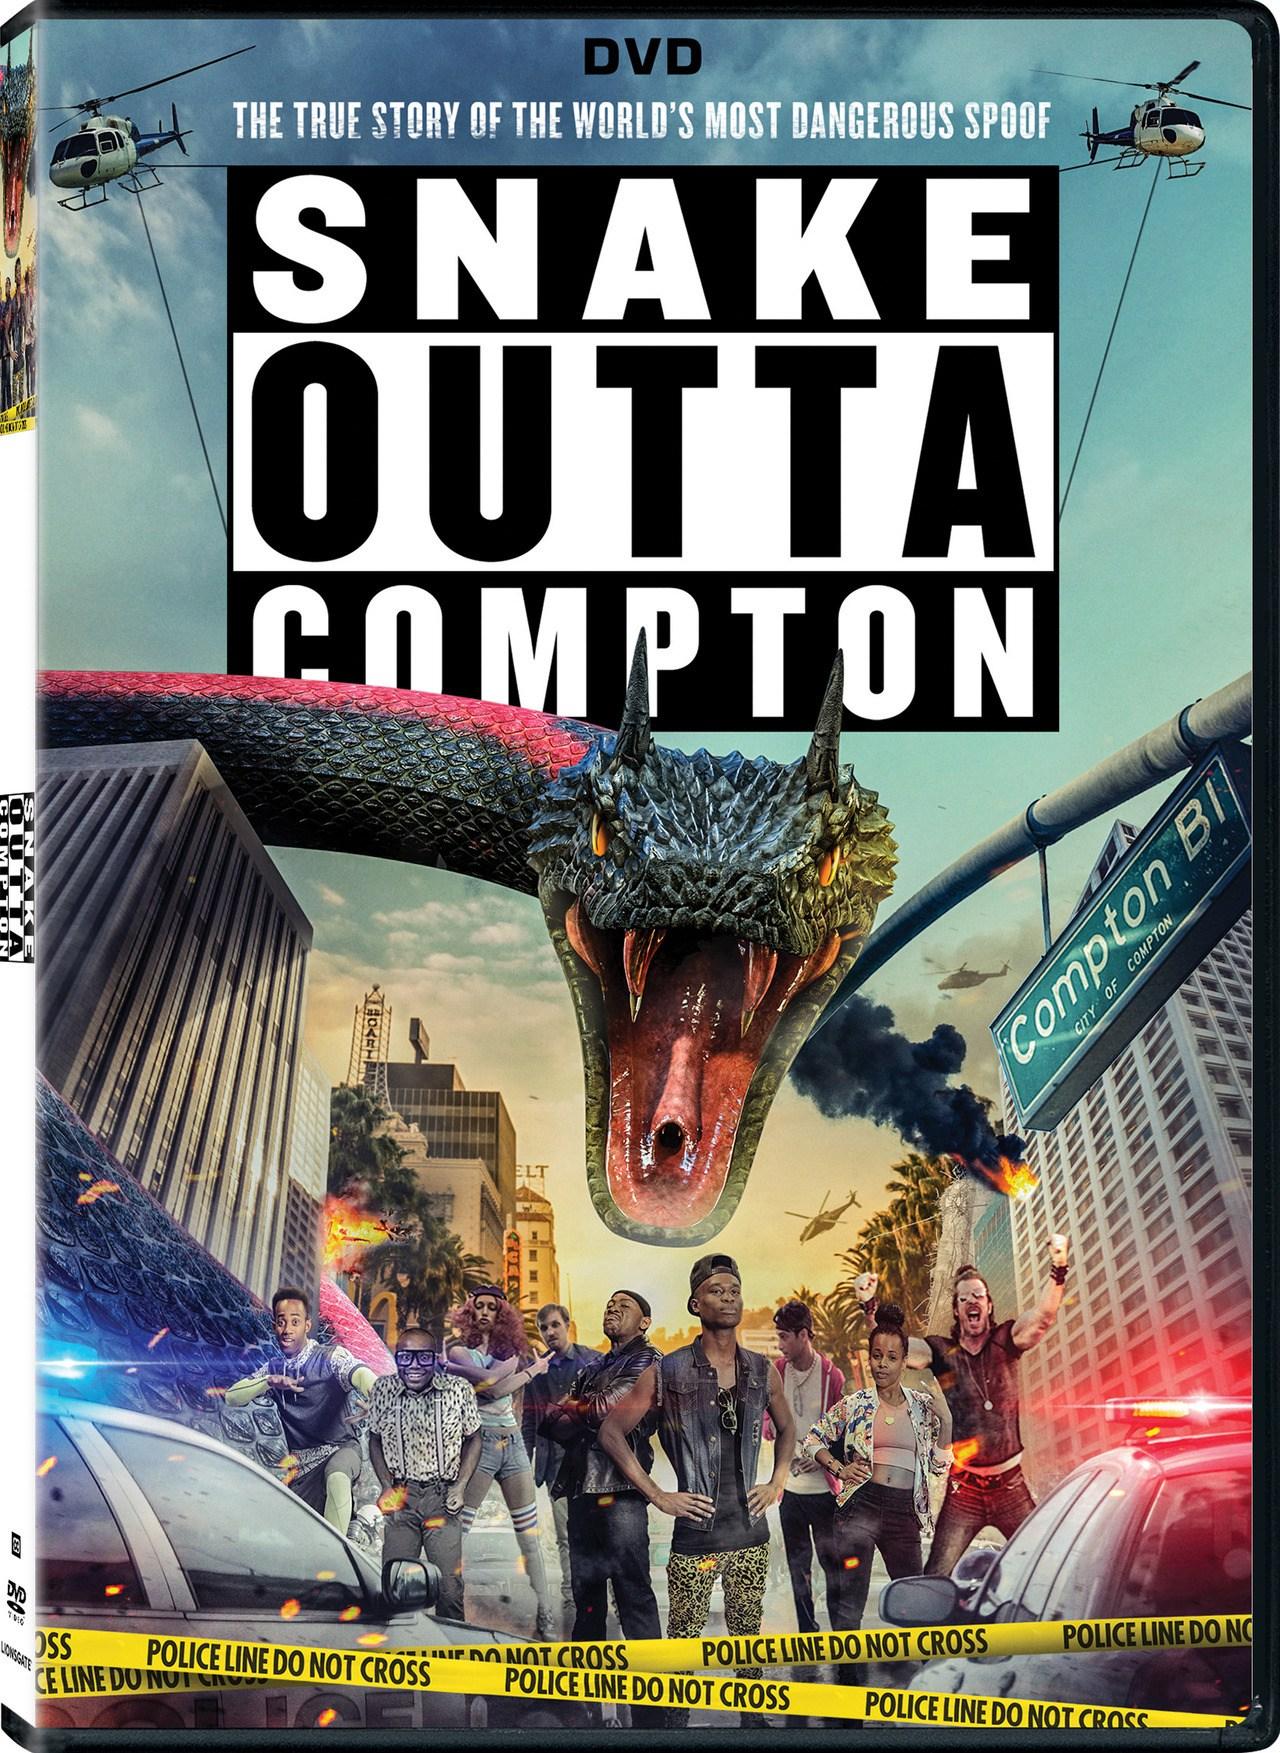 《康普頓有蛇》DVD預計10月出洞 - DreadCentral